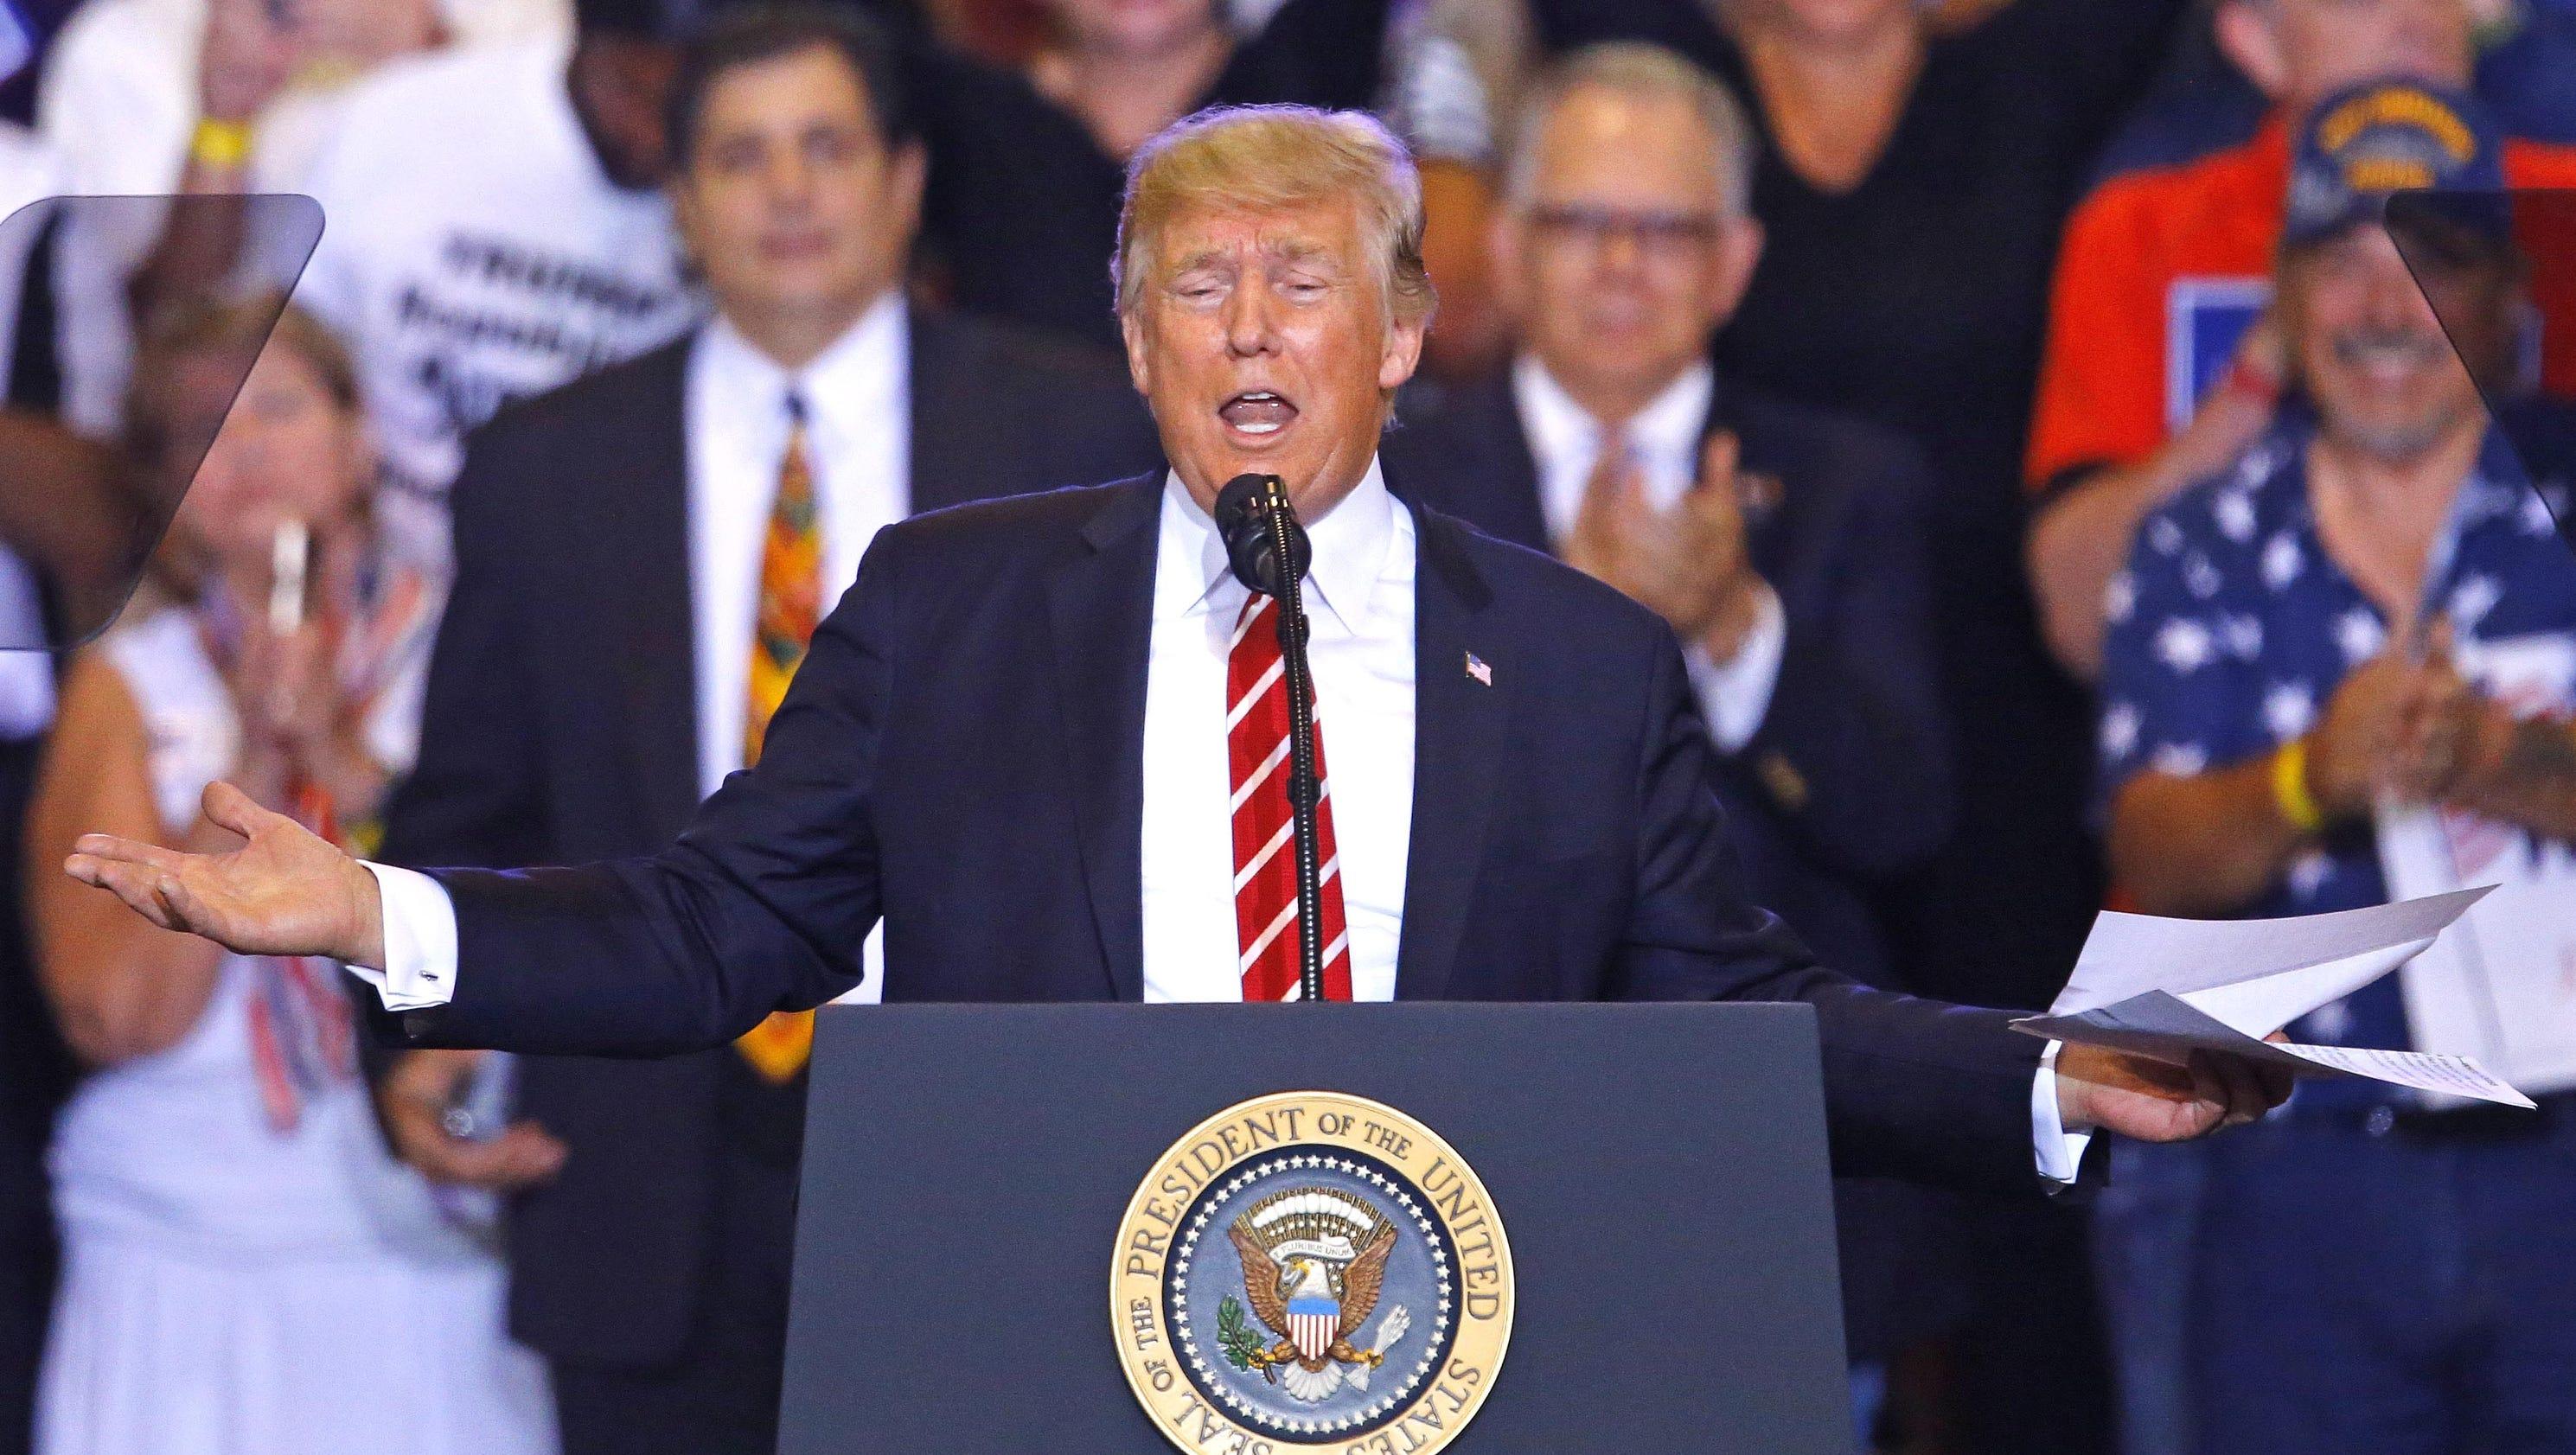 Fact check: At Phoenix rally, Trump revises history, exaggerates accomplishments and makes false claims